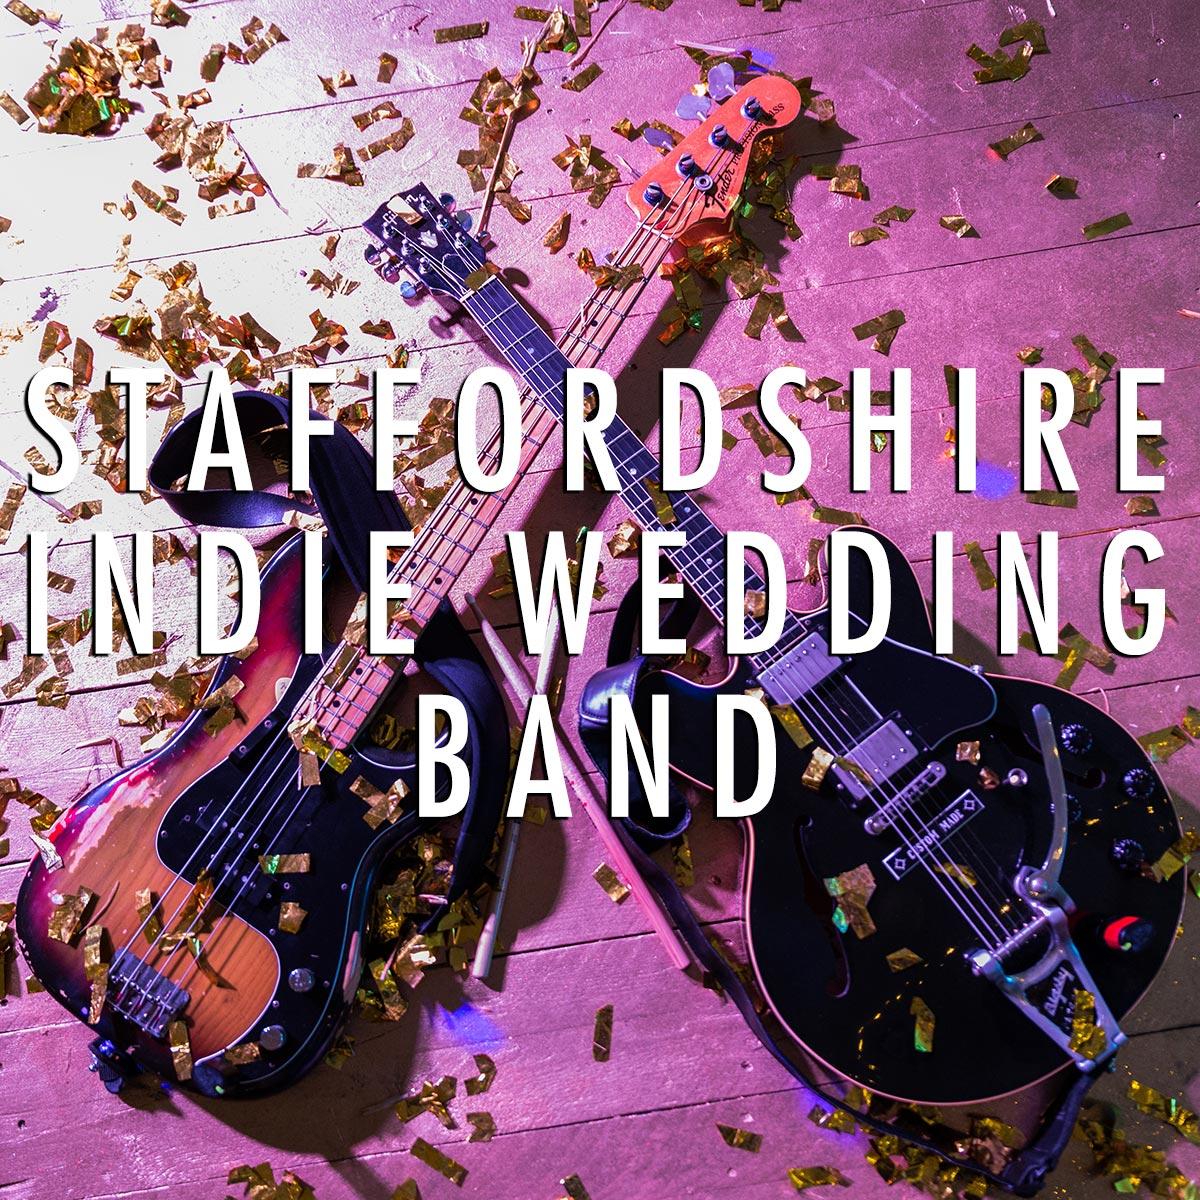 Staffordshire Indie Wedding Band